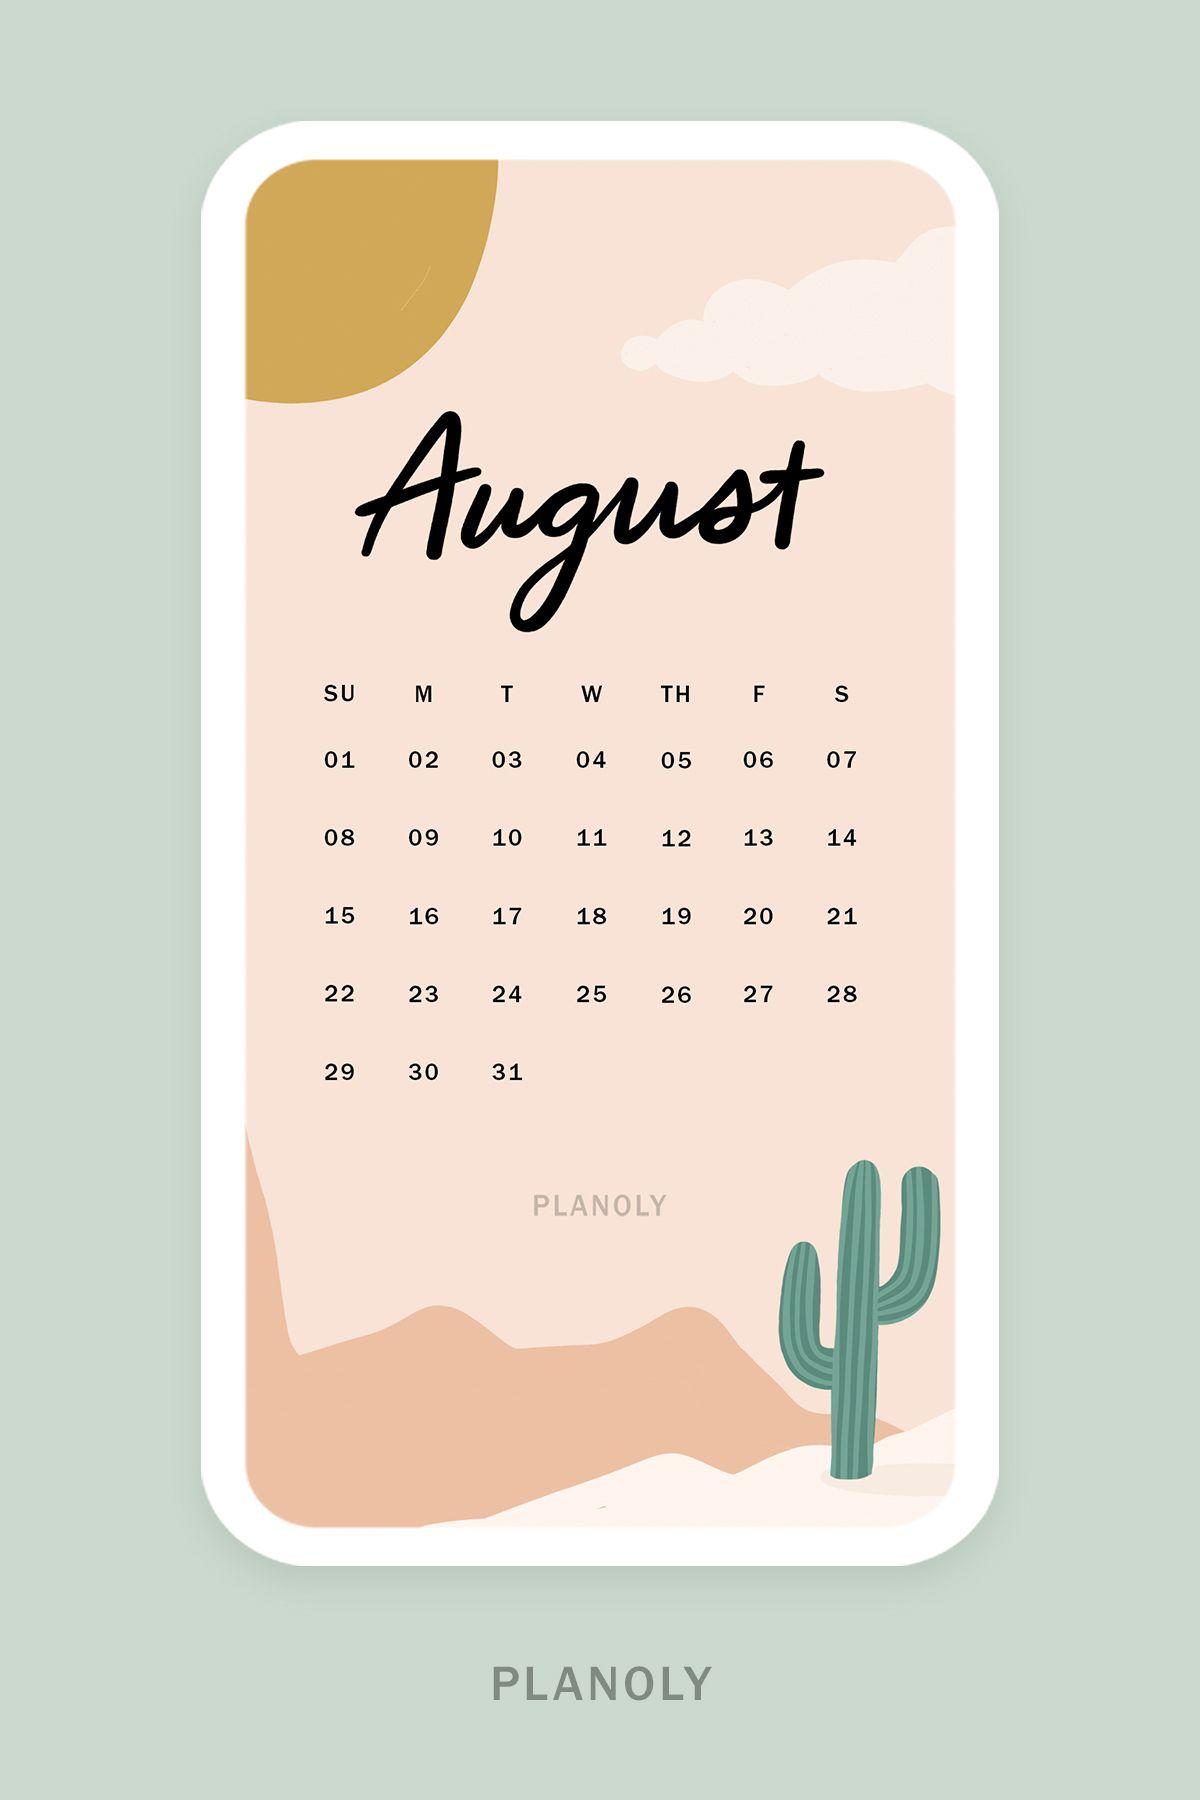 PLANOLY-Blog Post-Q3 Content Calendars-Image 5